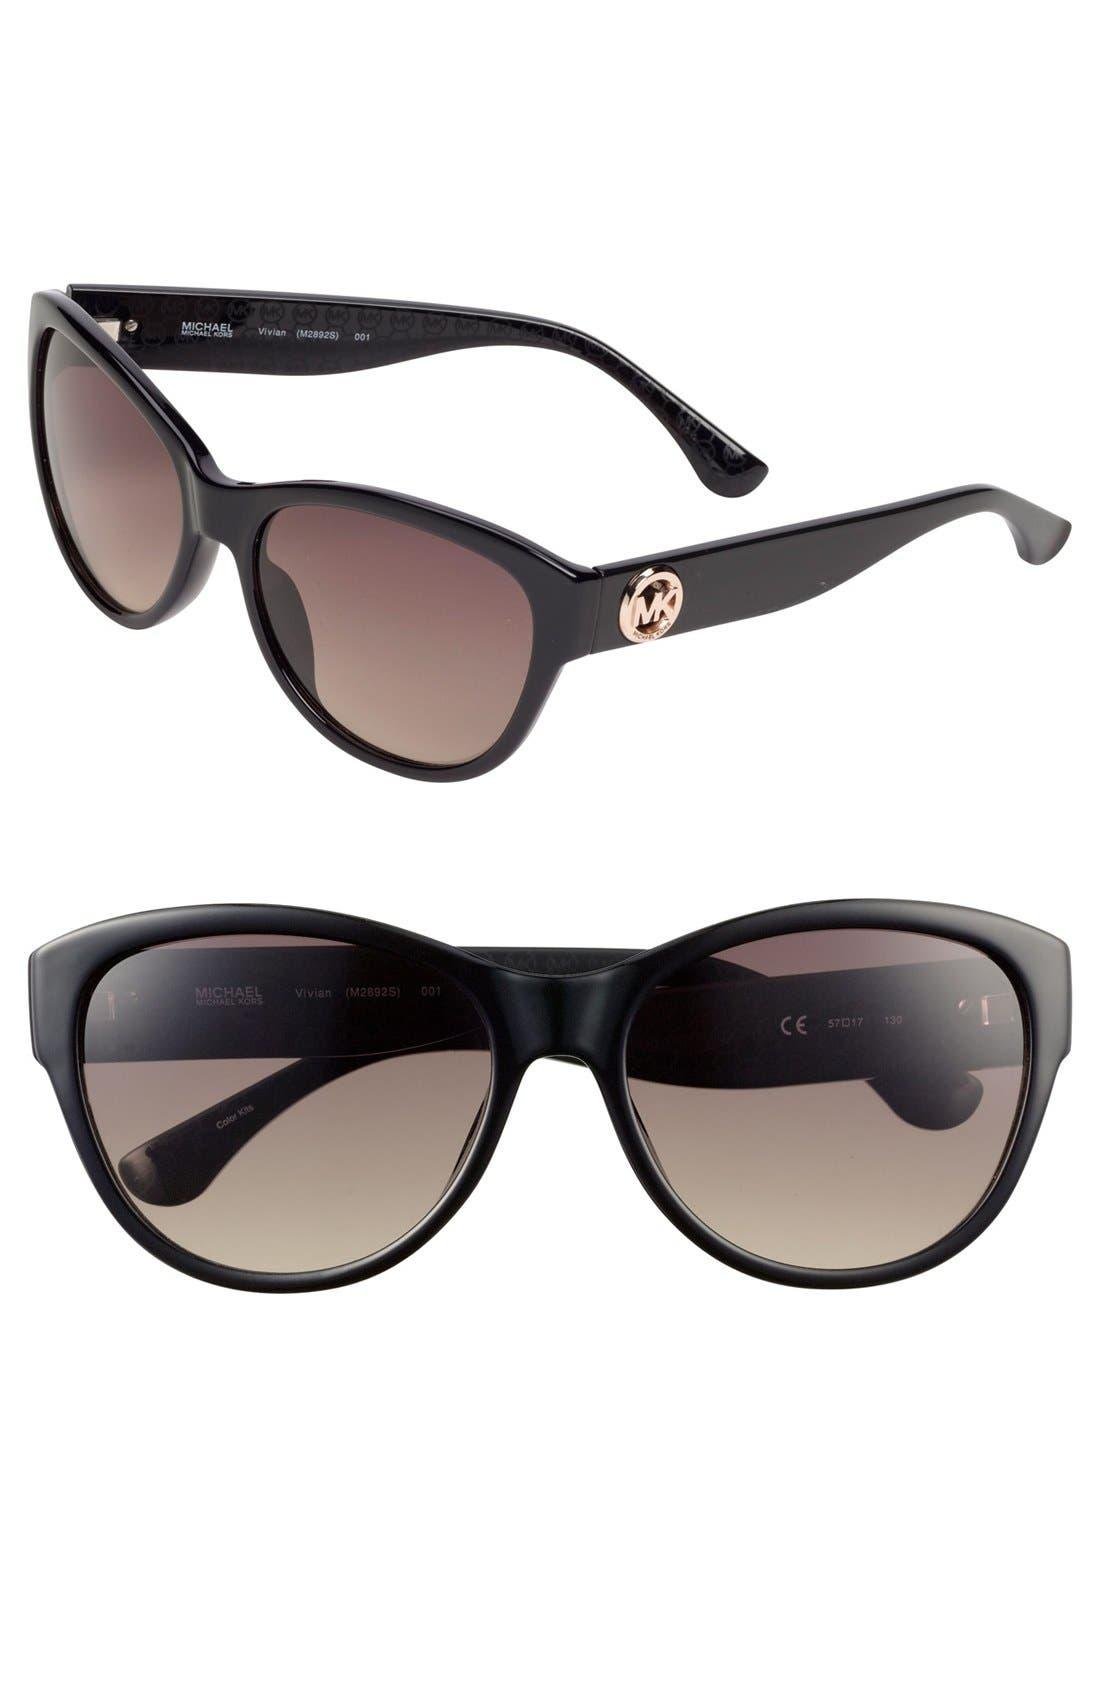 MICHAEL MICHAEL KORS 'Vivian' 57mm Sunglasses, Main, color, 001